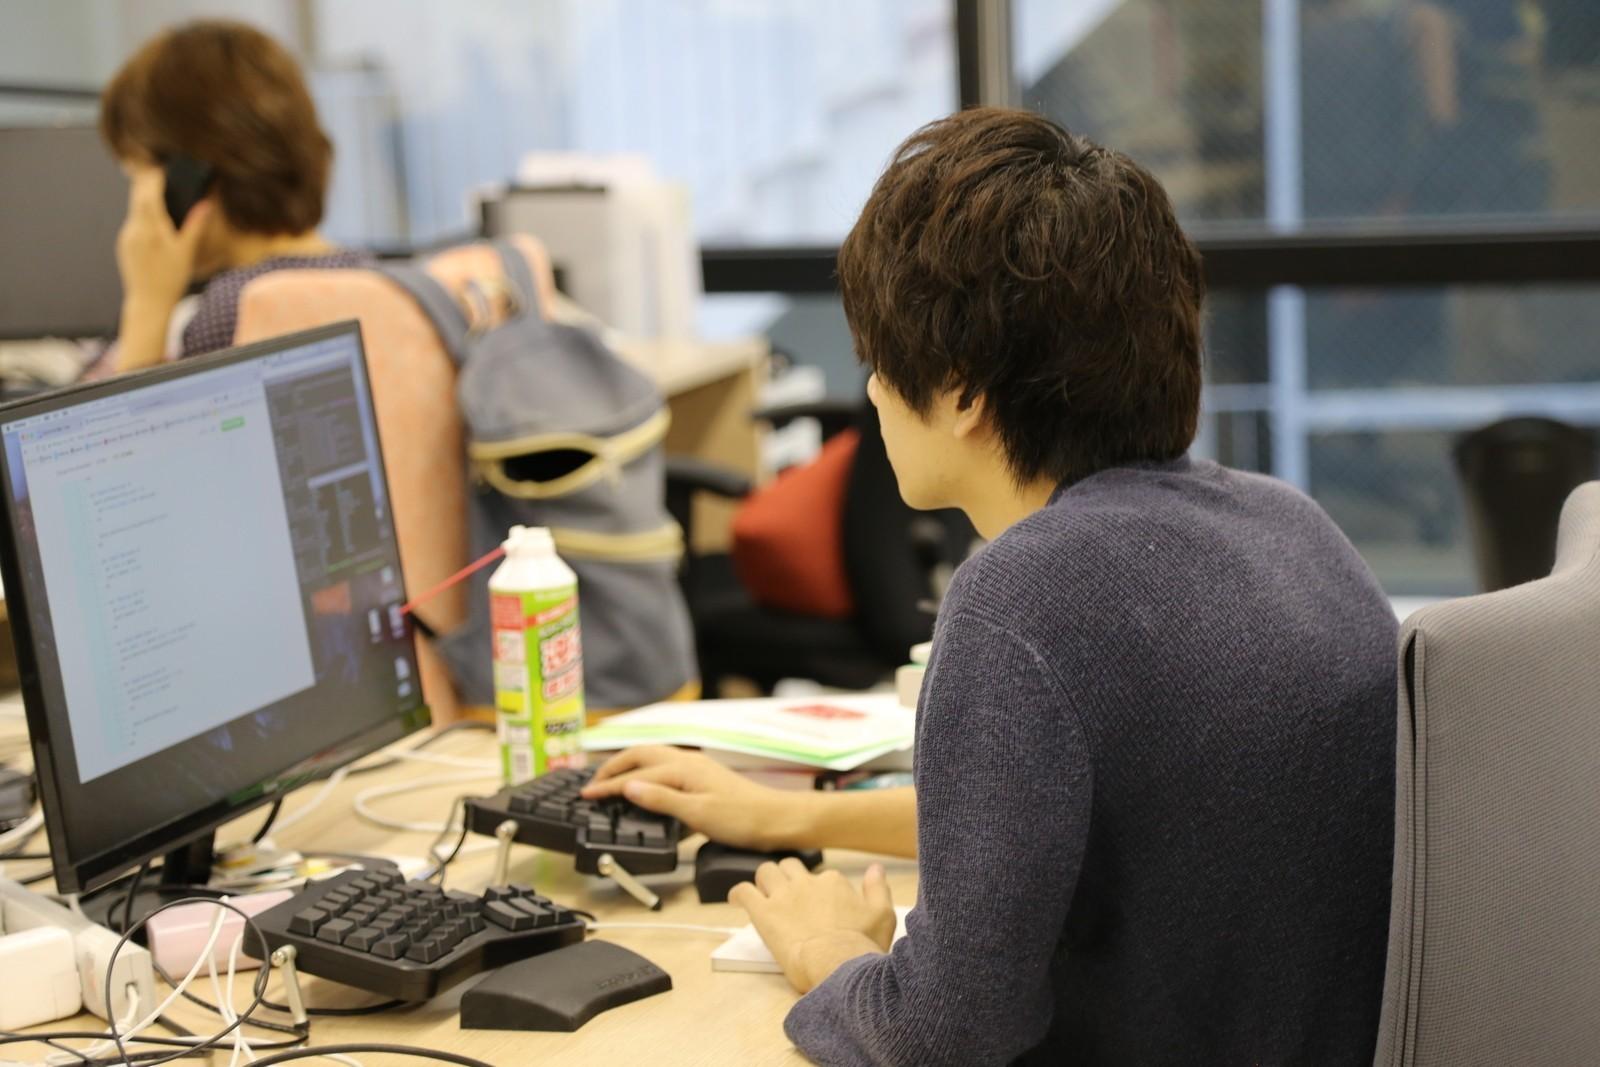 READYFOR株式会社・日本最大のクラウドファンディング「Readyfor」を開発するフロントエンジニアを募集!